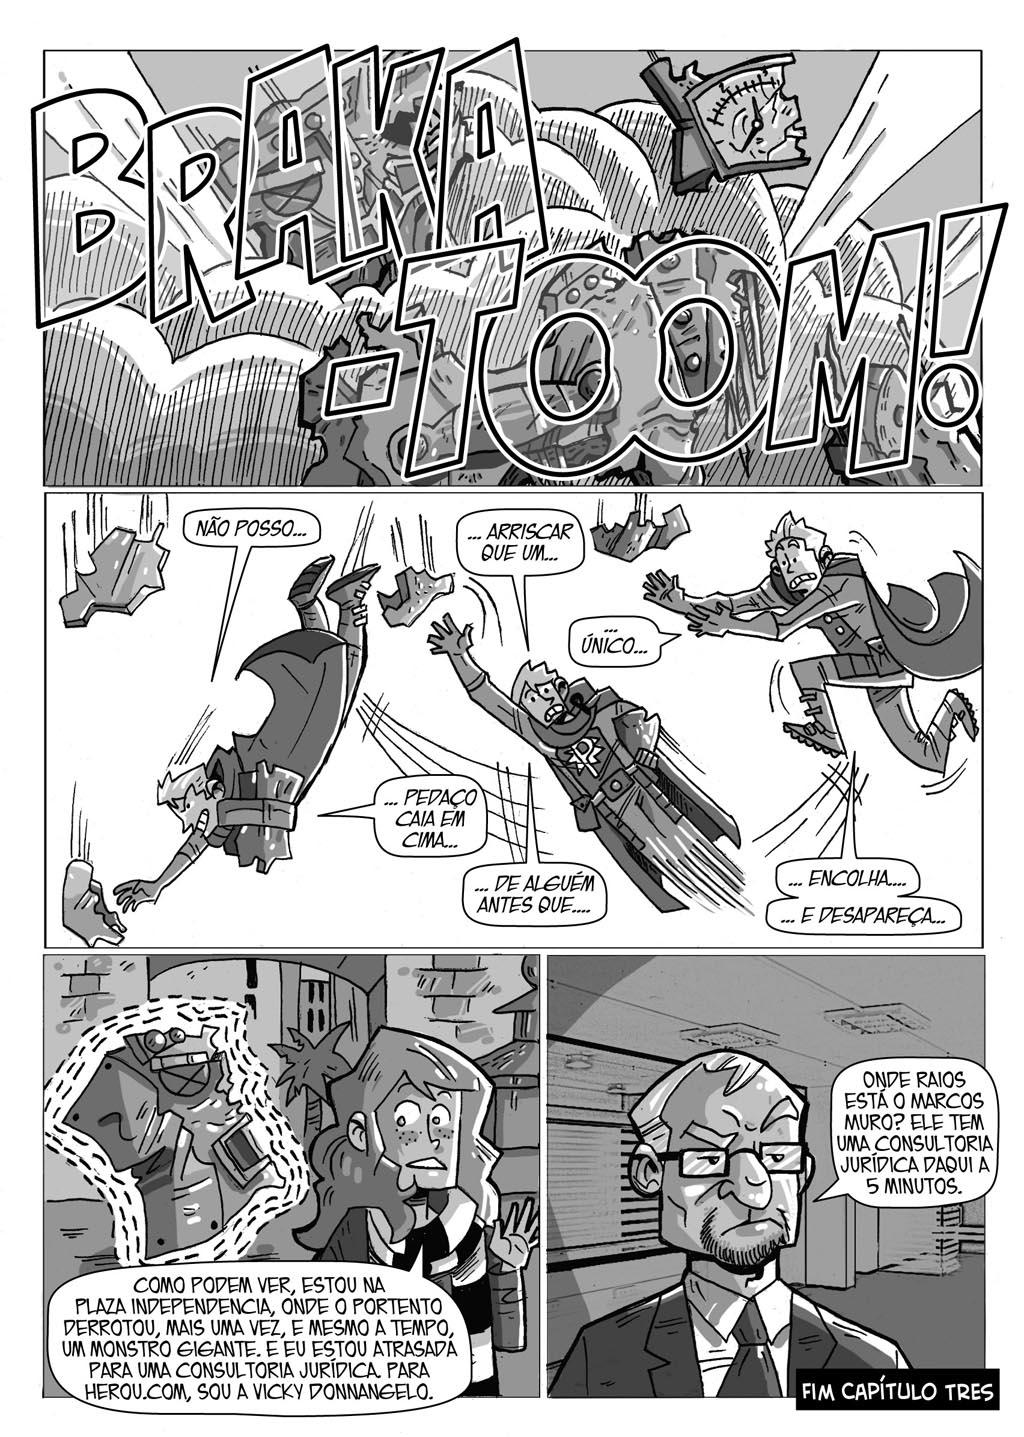 Portento - Página 19